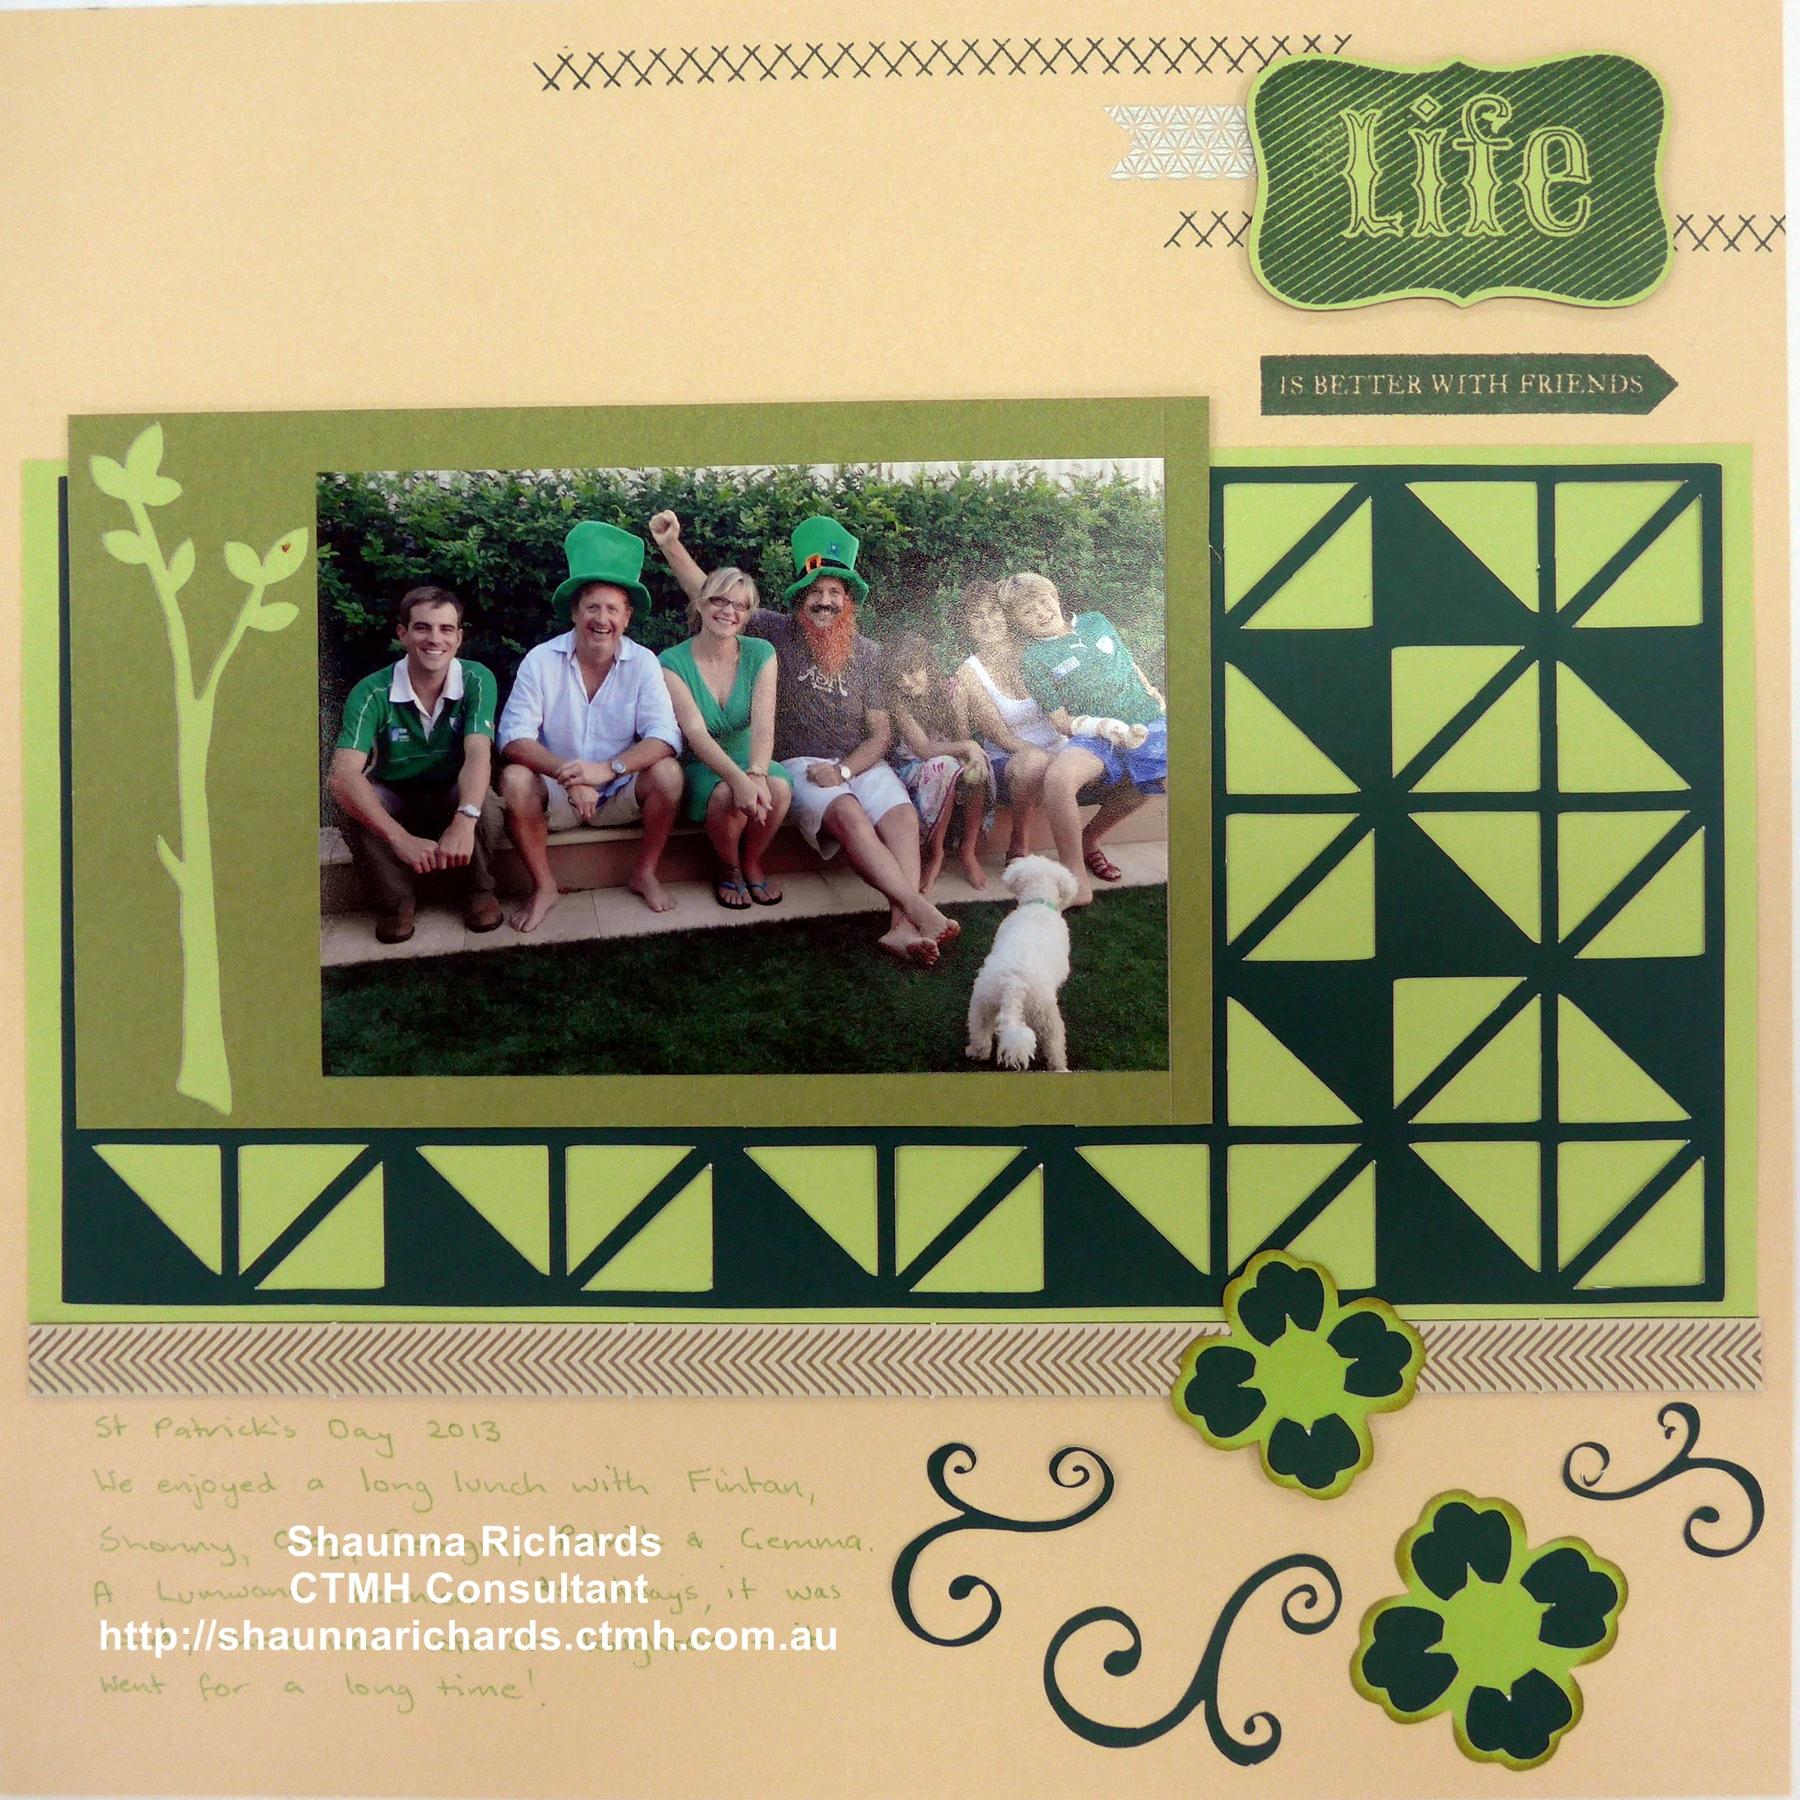 St Patricks day - Page 003